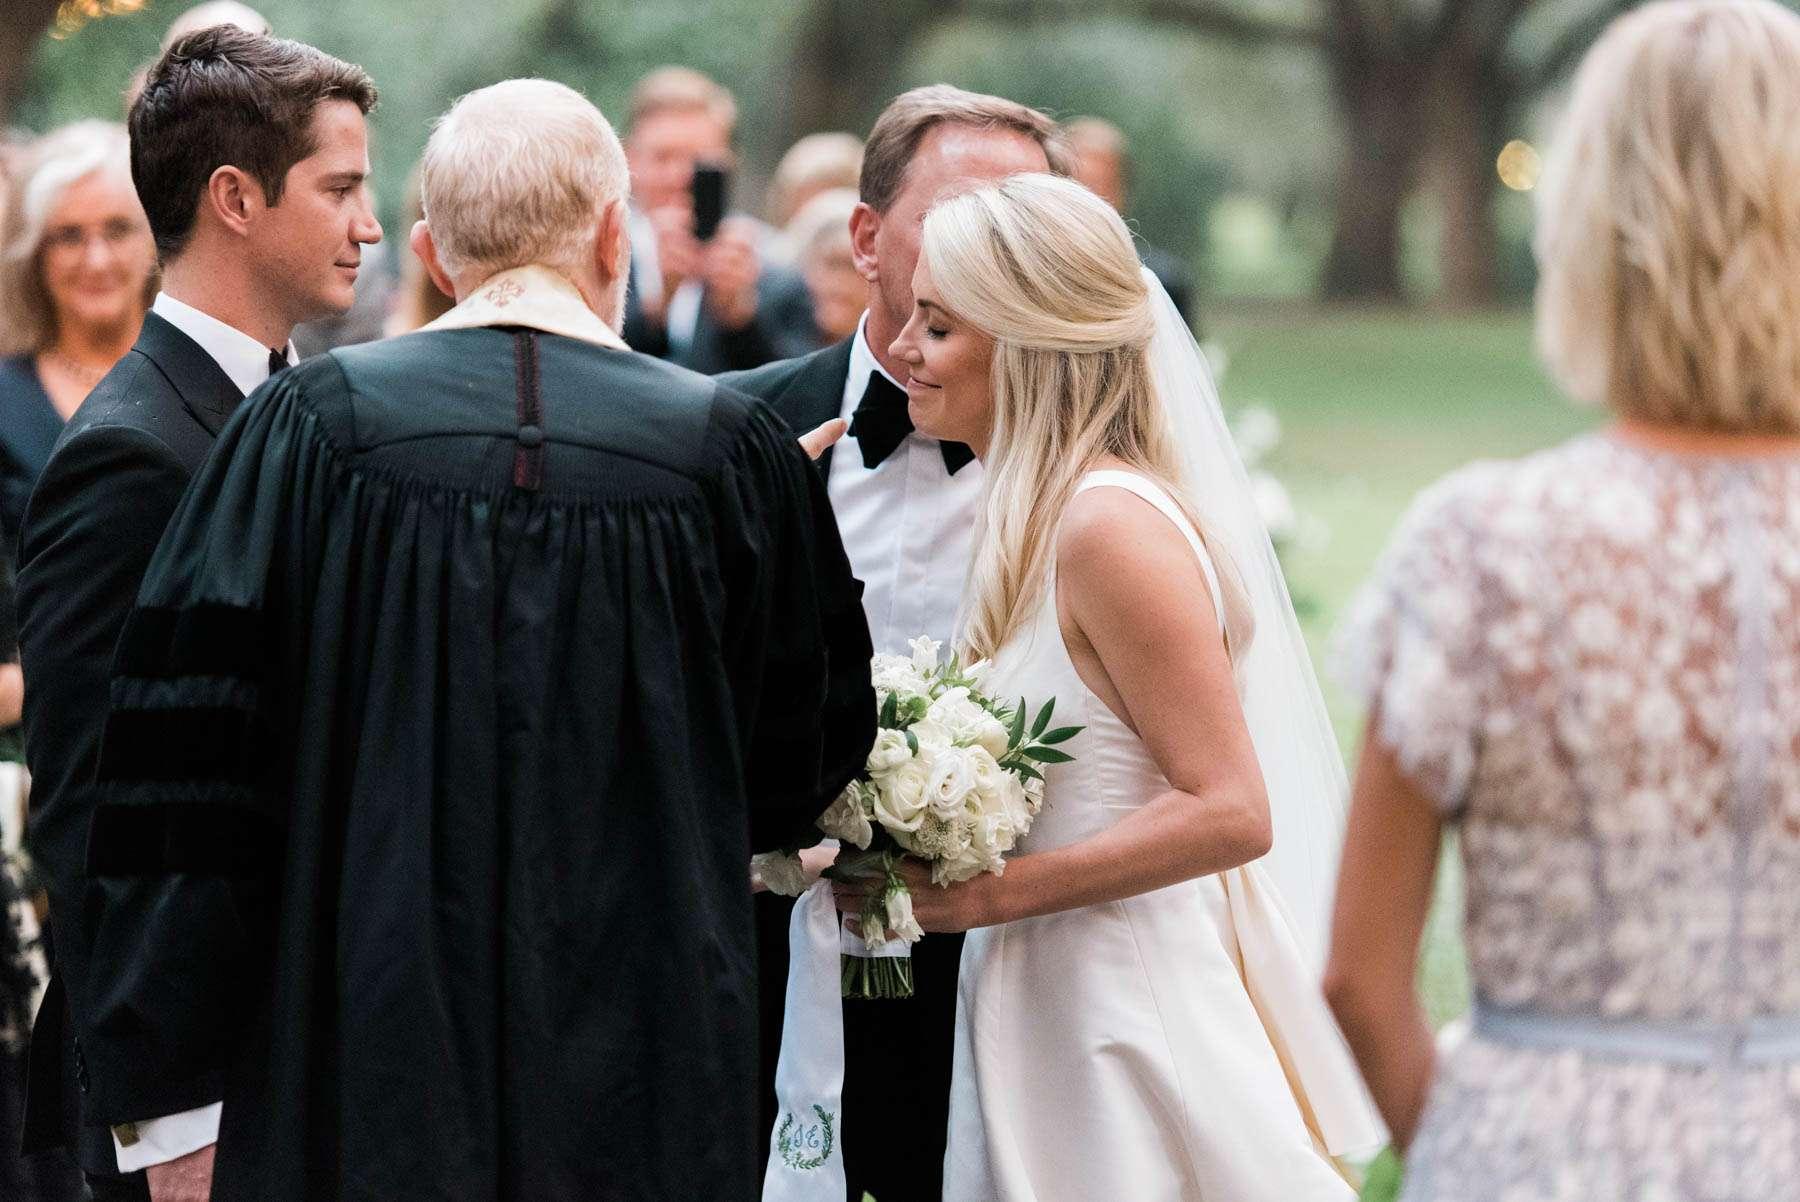 Saying I Do: Our Wedding Ceremony // Rhyme & Reason